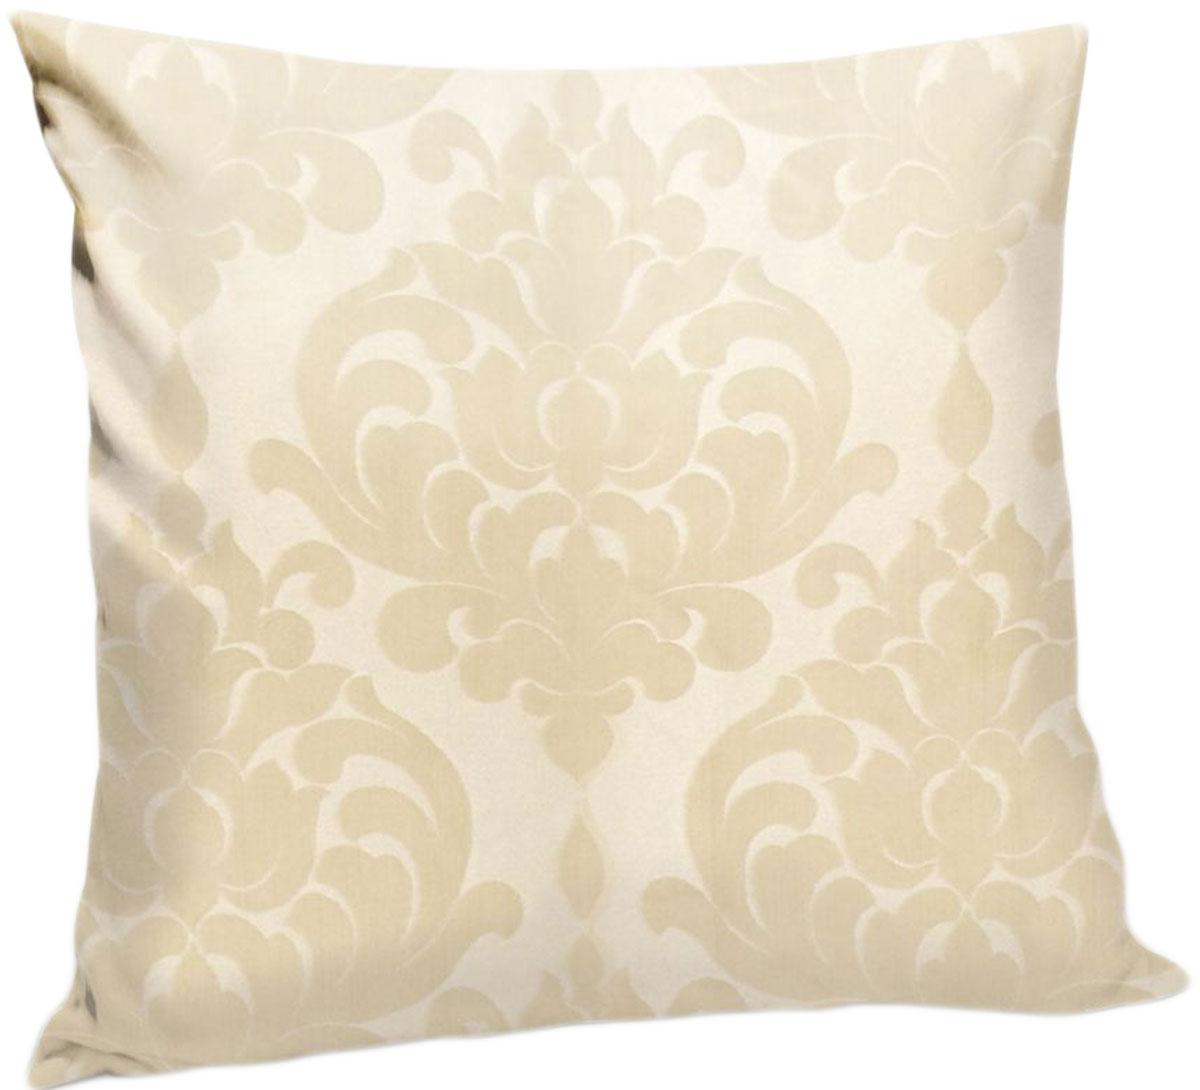 Подушка декоративная KauffOrt Бордо, цвет: светло-бежевый, 40 x 40 см штора легкая kauffort barolo